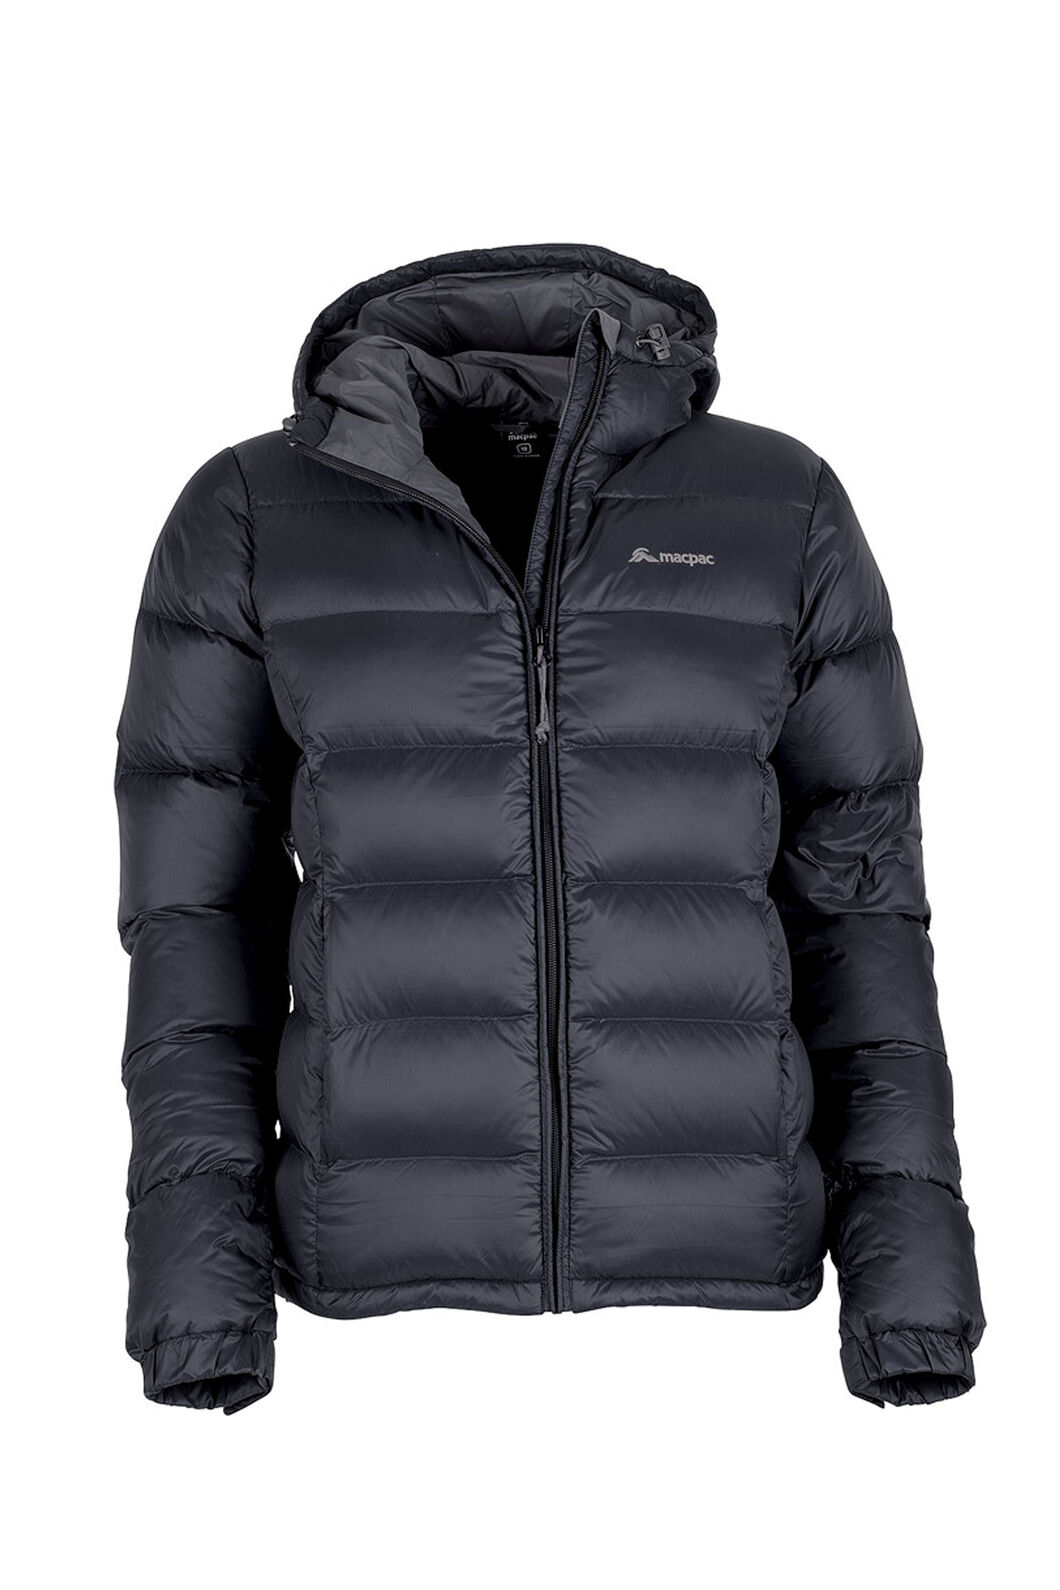 Macpac Halo Hooded Down Jacket - Women's, Black, hi-res